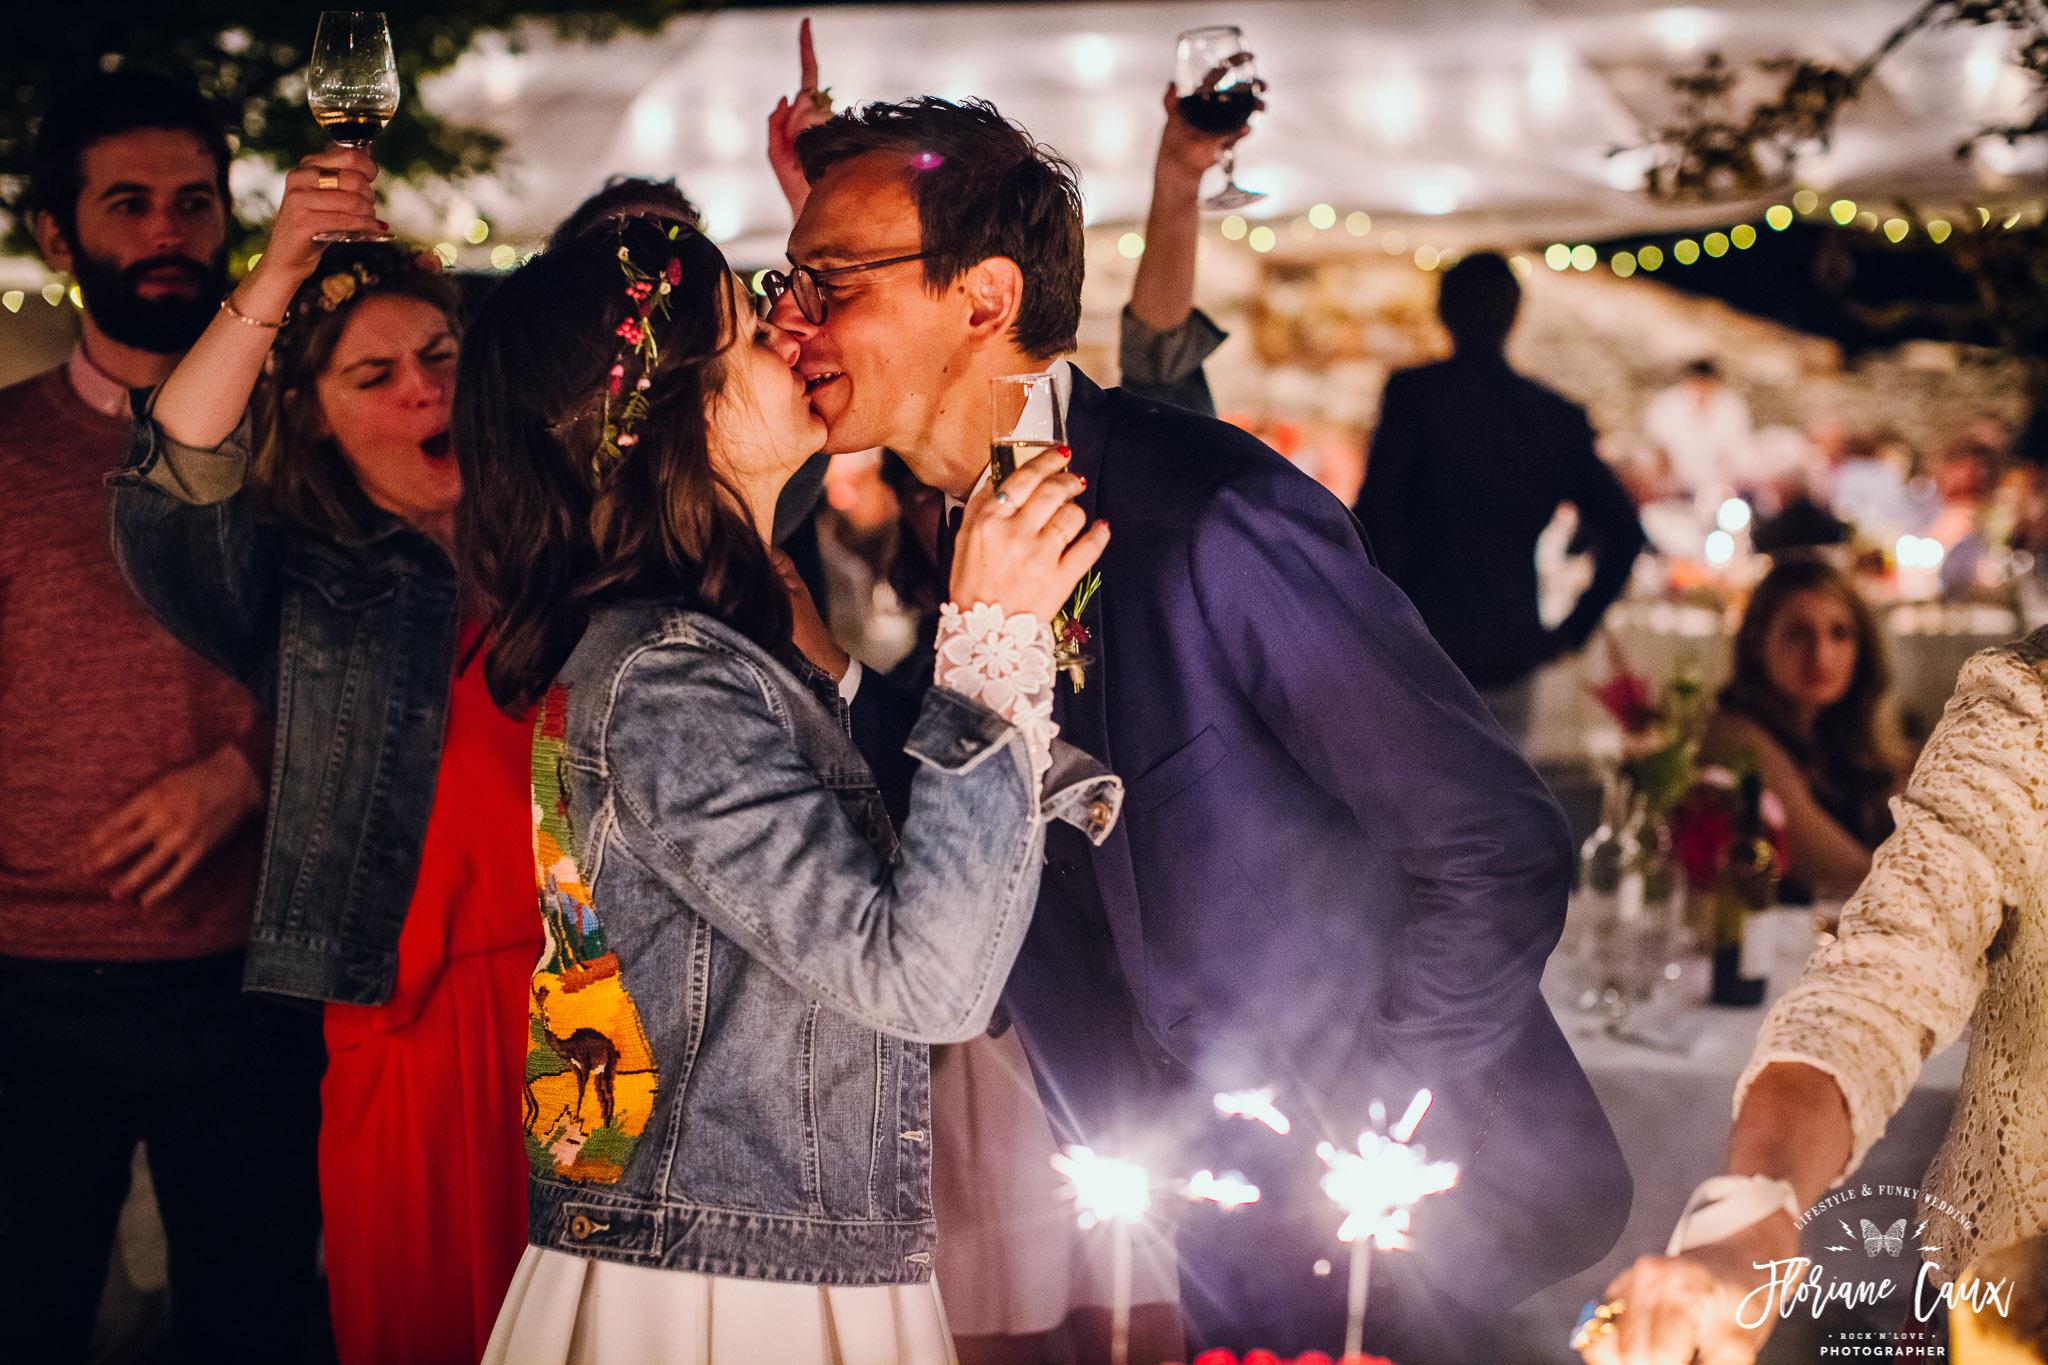 my-dear-festival-party-mariage-chez-soi-12